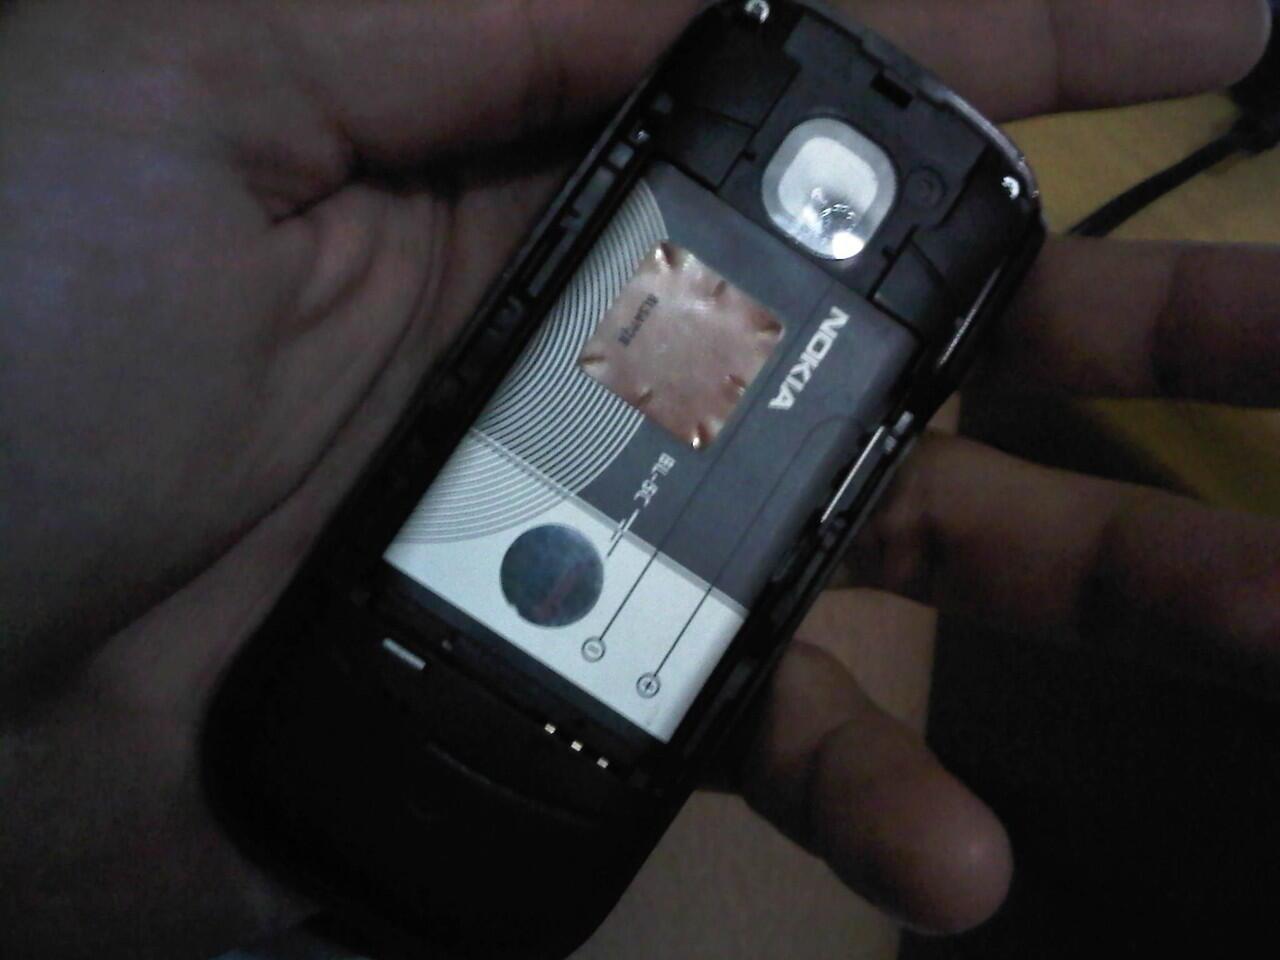 Nokia 2330. Best offer, kondisi baik!